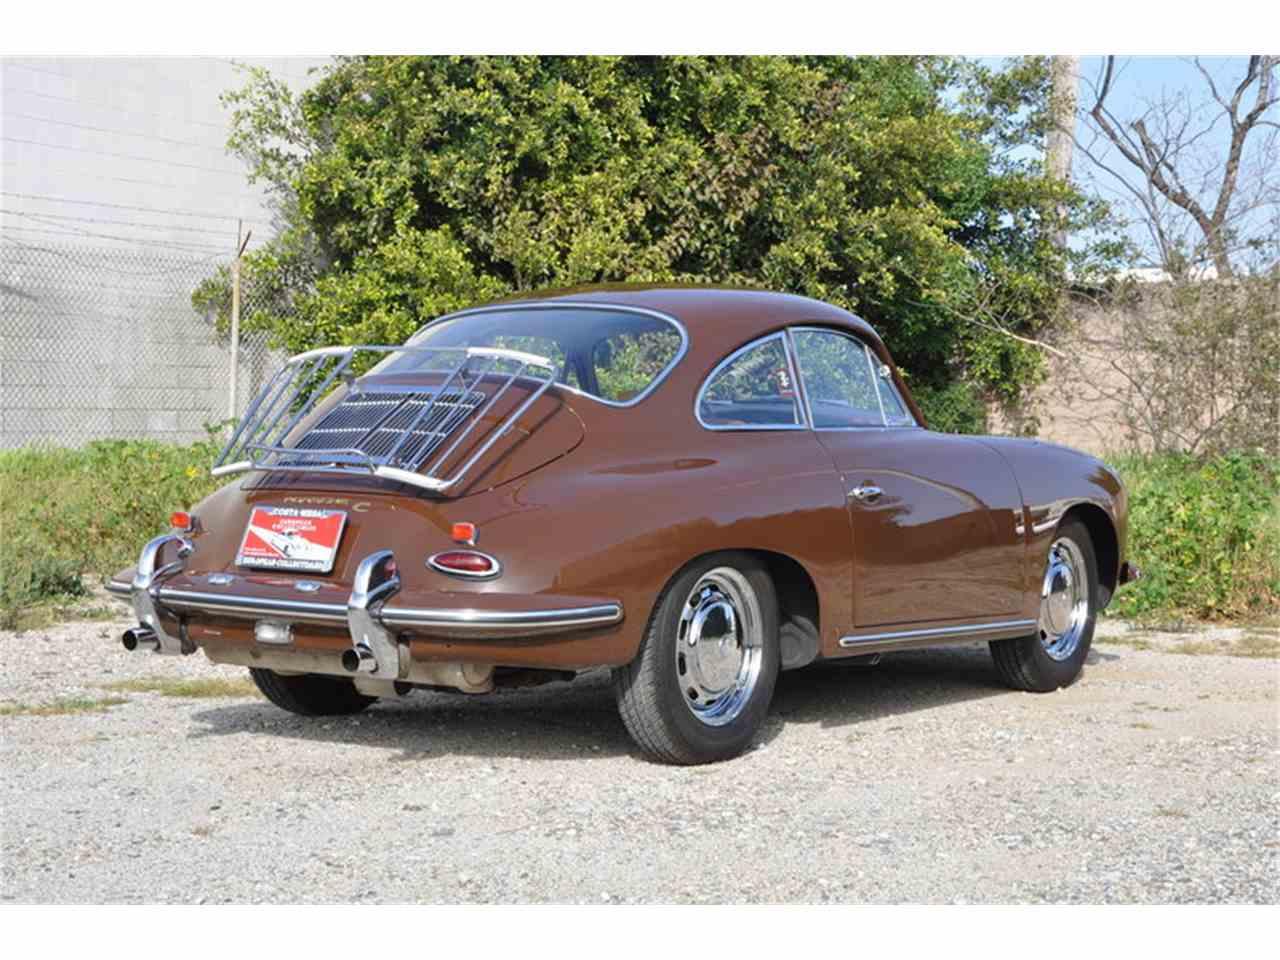 1965 porsche 356 for sale cc 966566 for Mesa porche